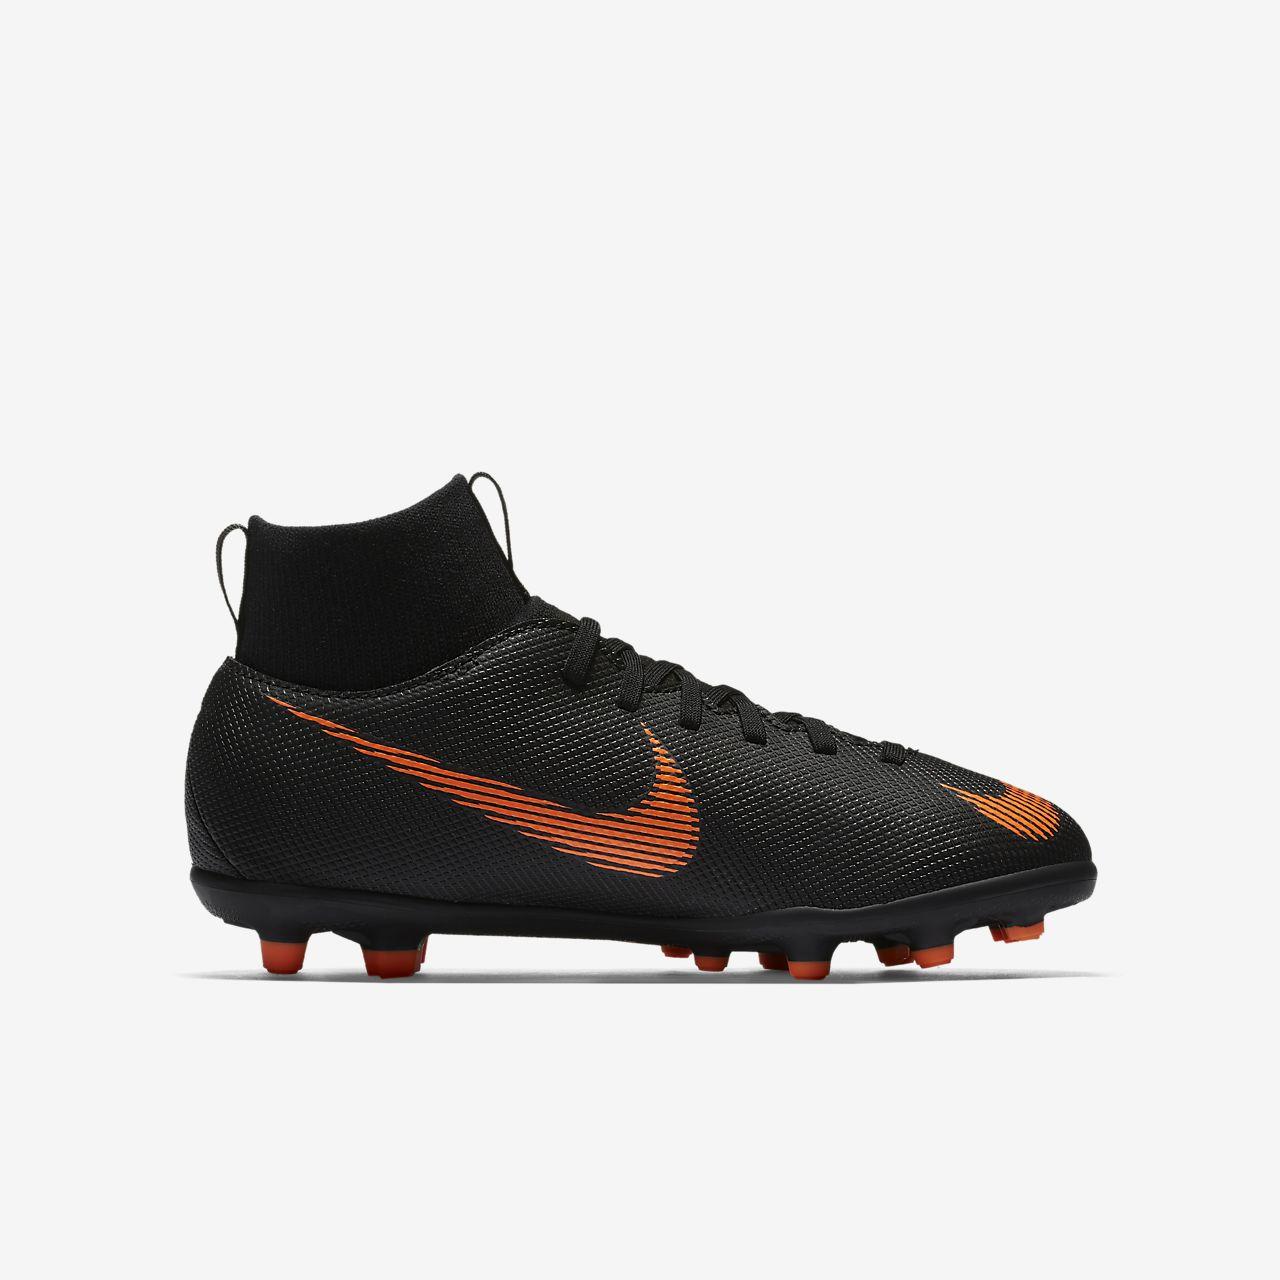 best service a8b21 c046a (enfant) Nike Chaussure de football Mercurial Superfly VI Club CR7 MG Junior